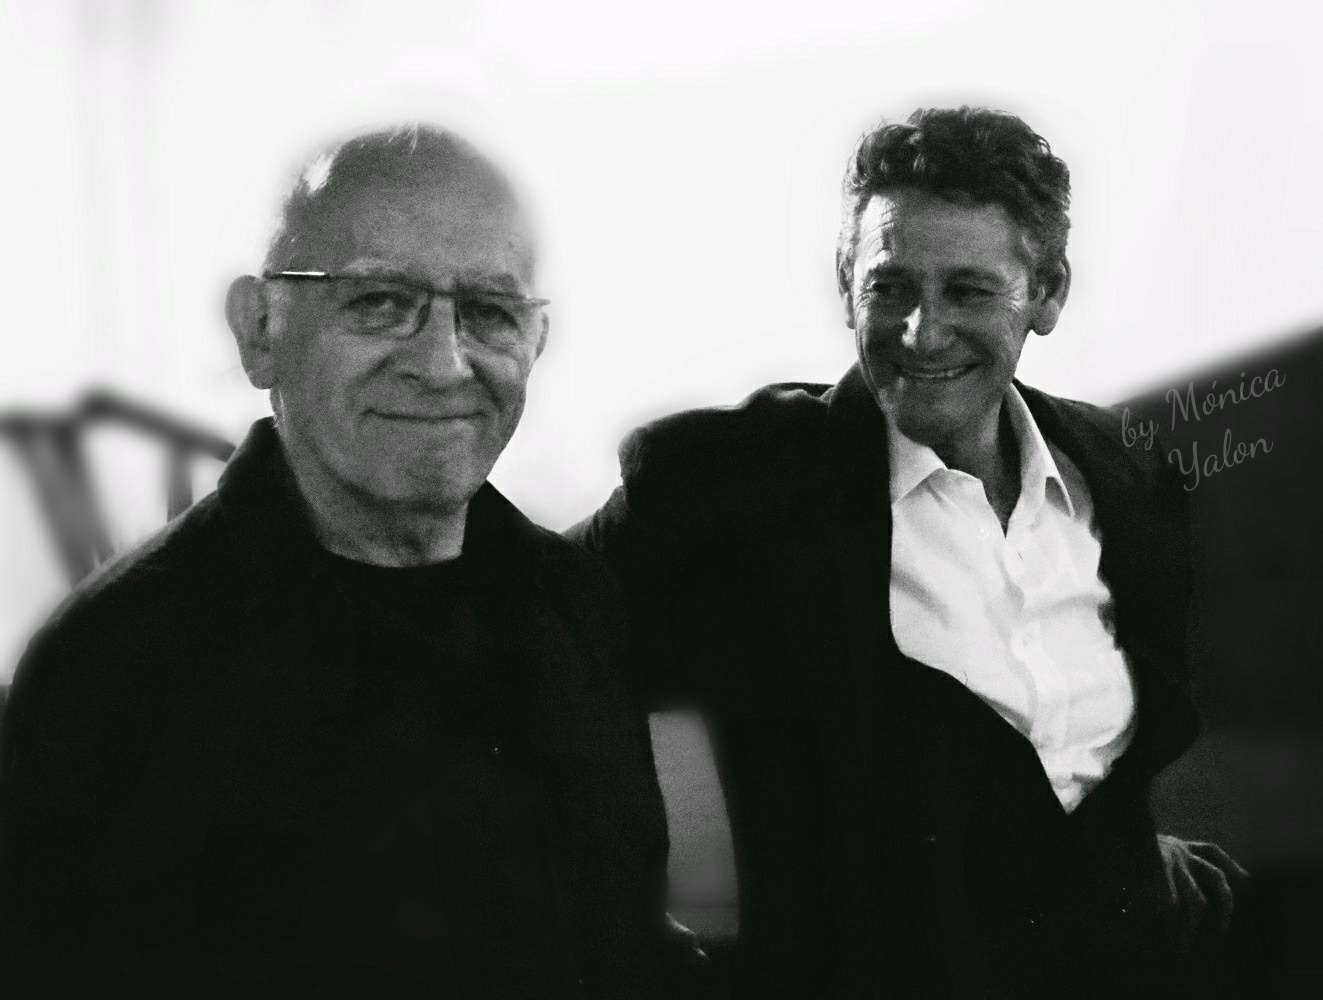 Norberto Kahan y Daniel Giusti (Bail